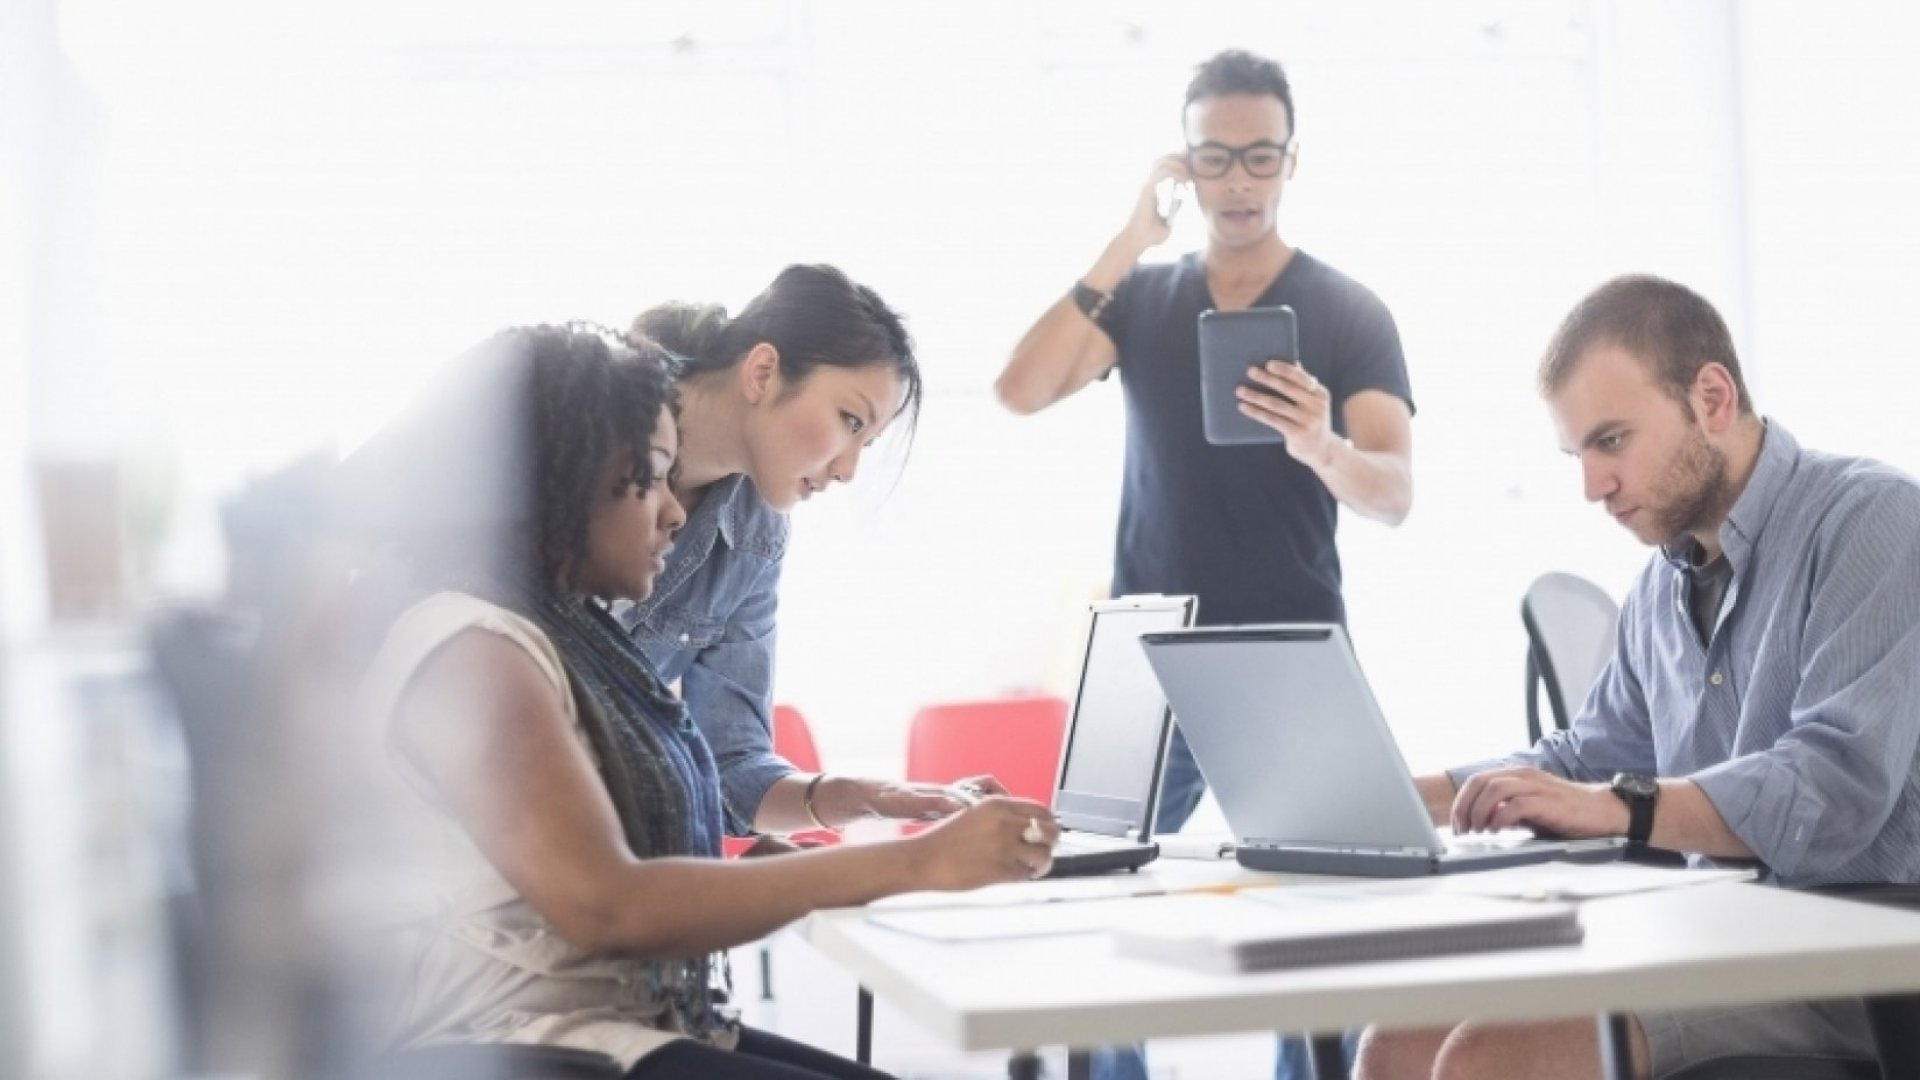 7 Ways Millennial Managers Will Change Work